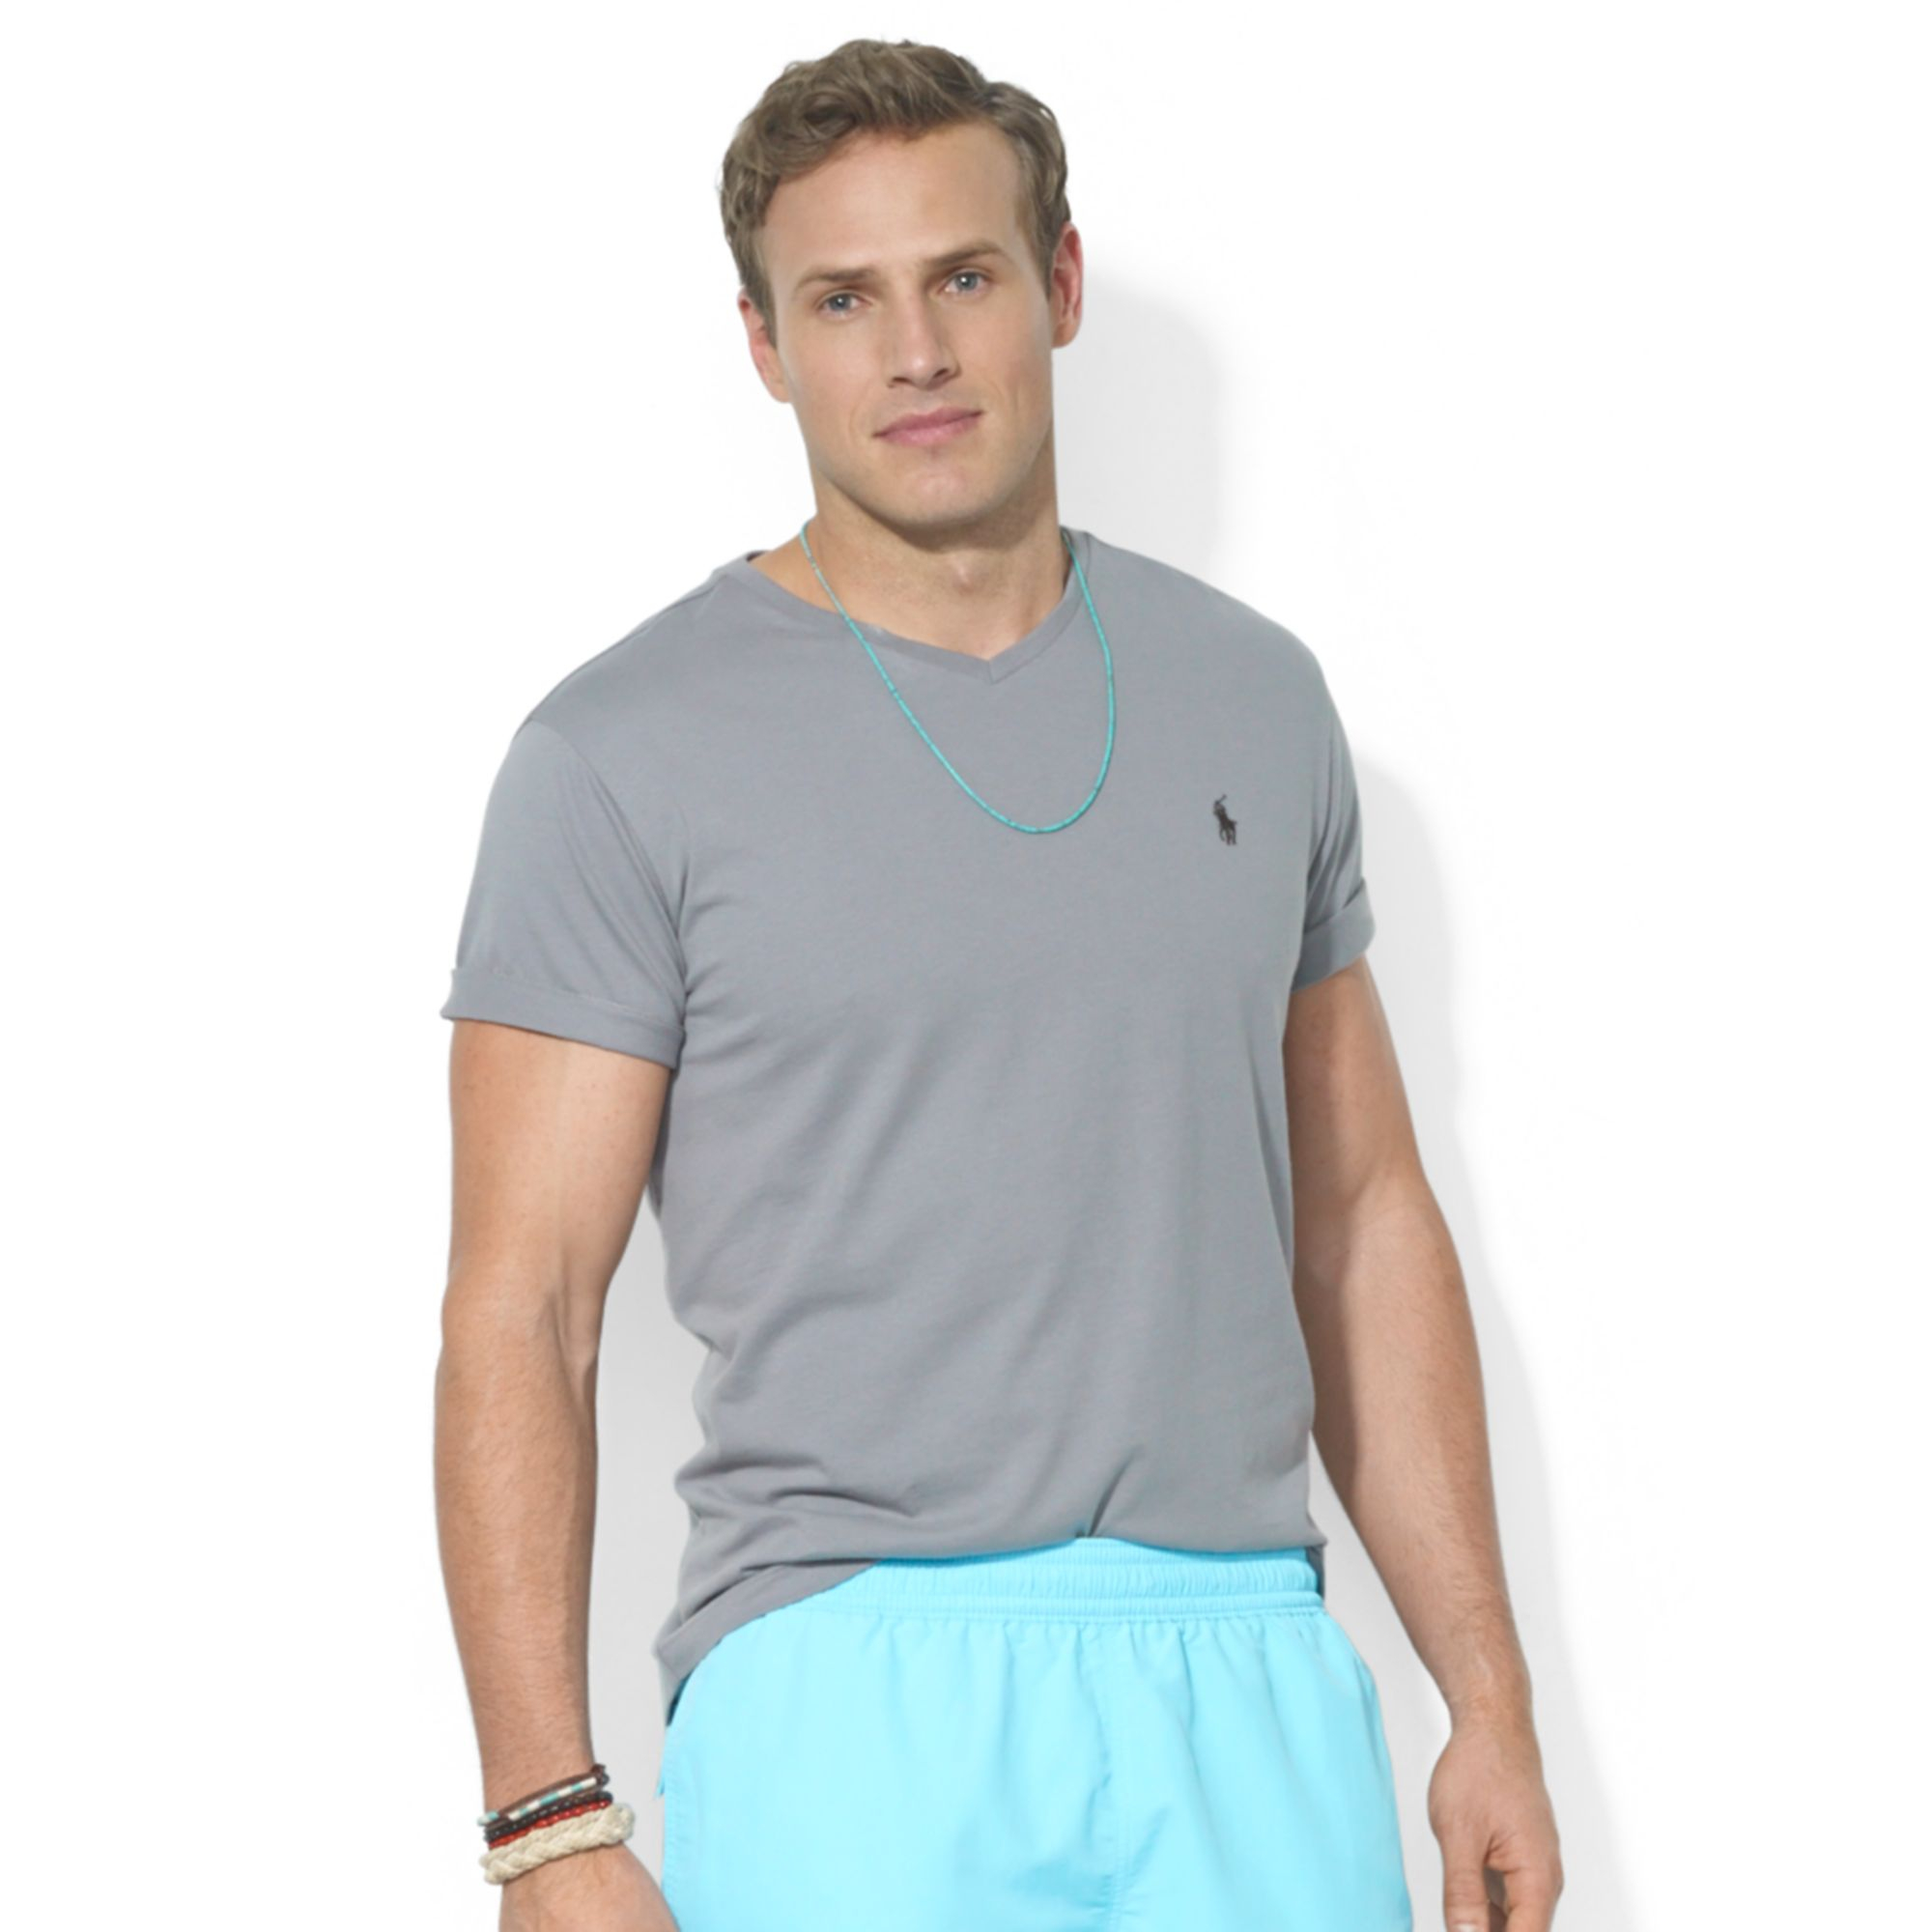 cae5a6284a39 Polo Ralph Lauren Mens Classic Fit T Shirt – Rockwall Auction